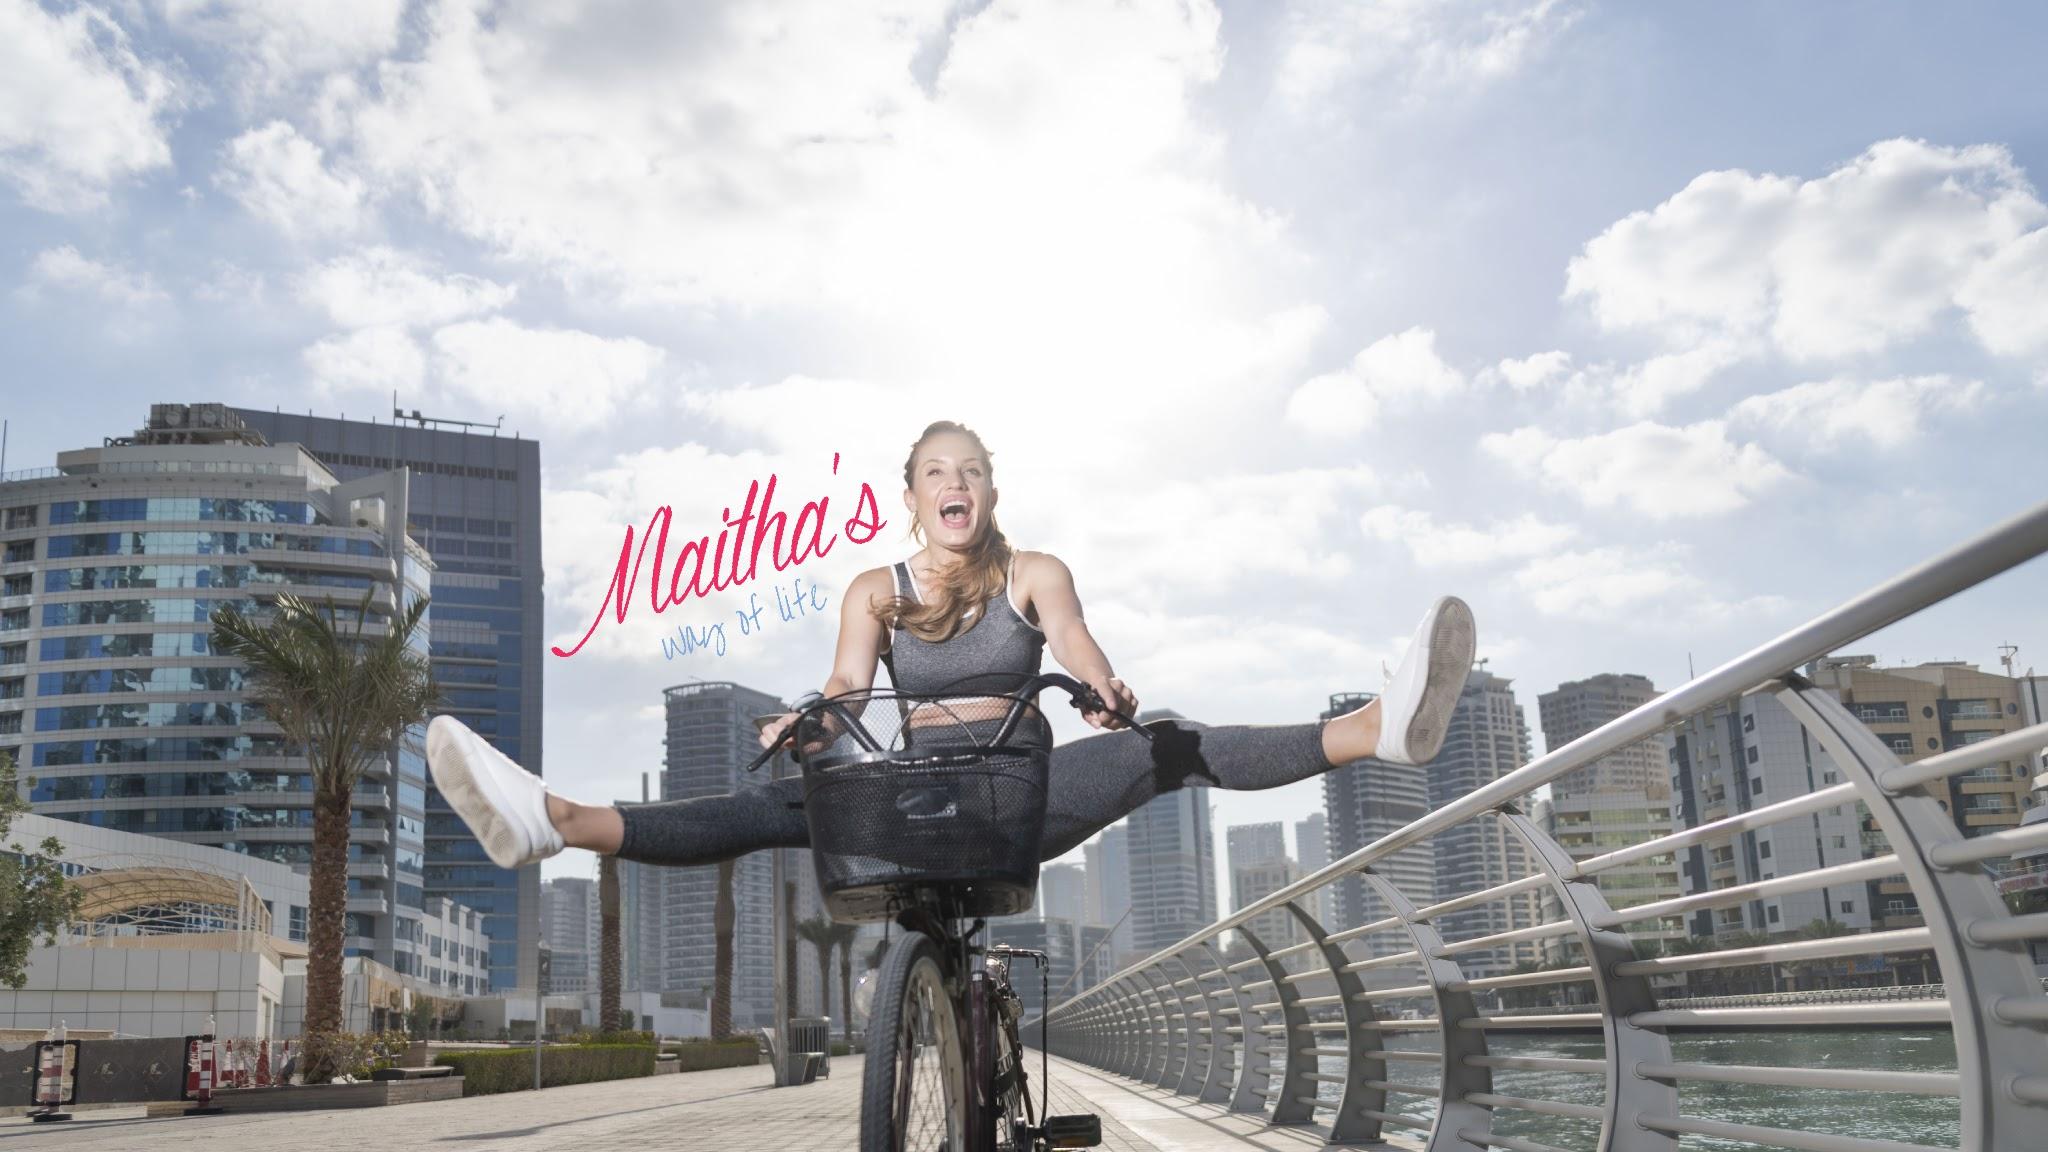 Maitha's Way Of Life - Maitha E. Coninx